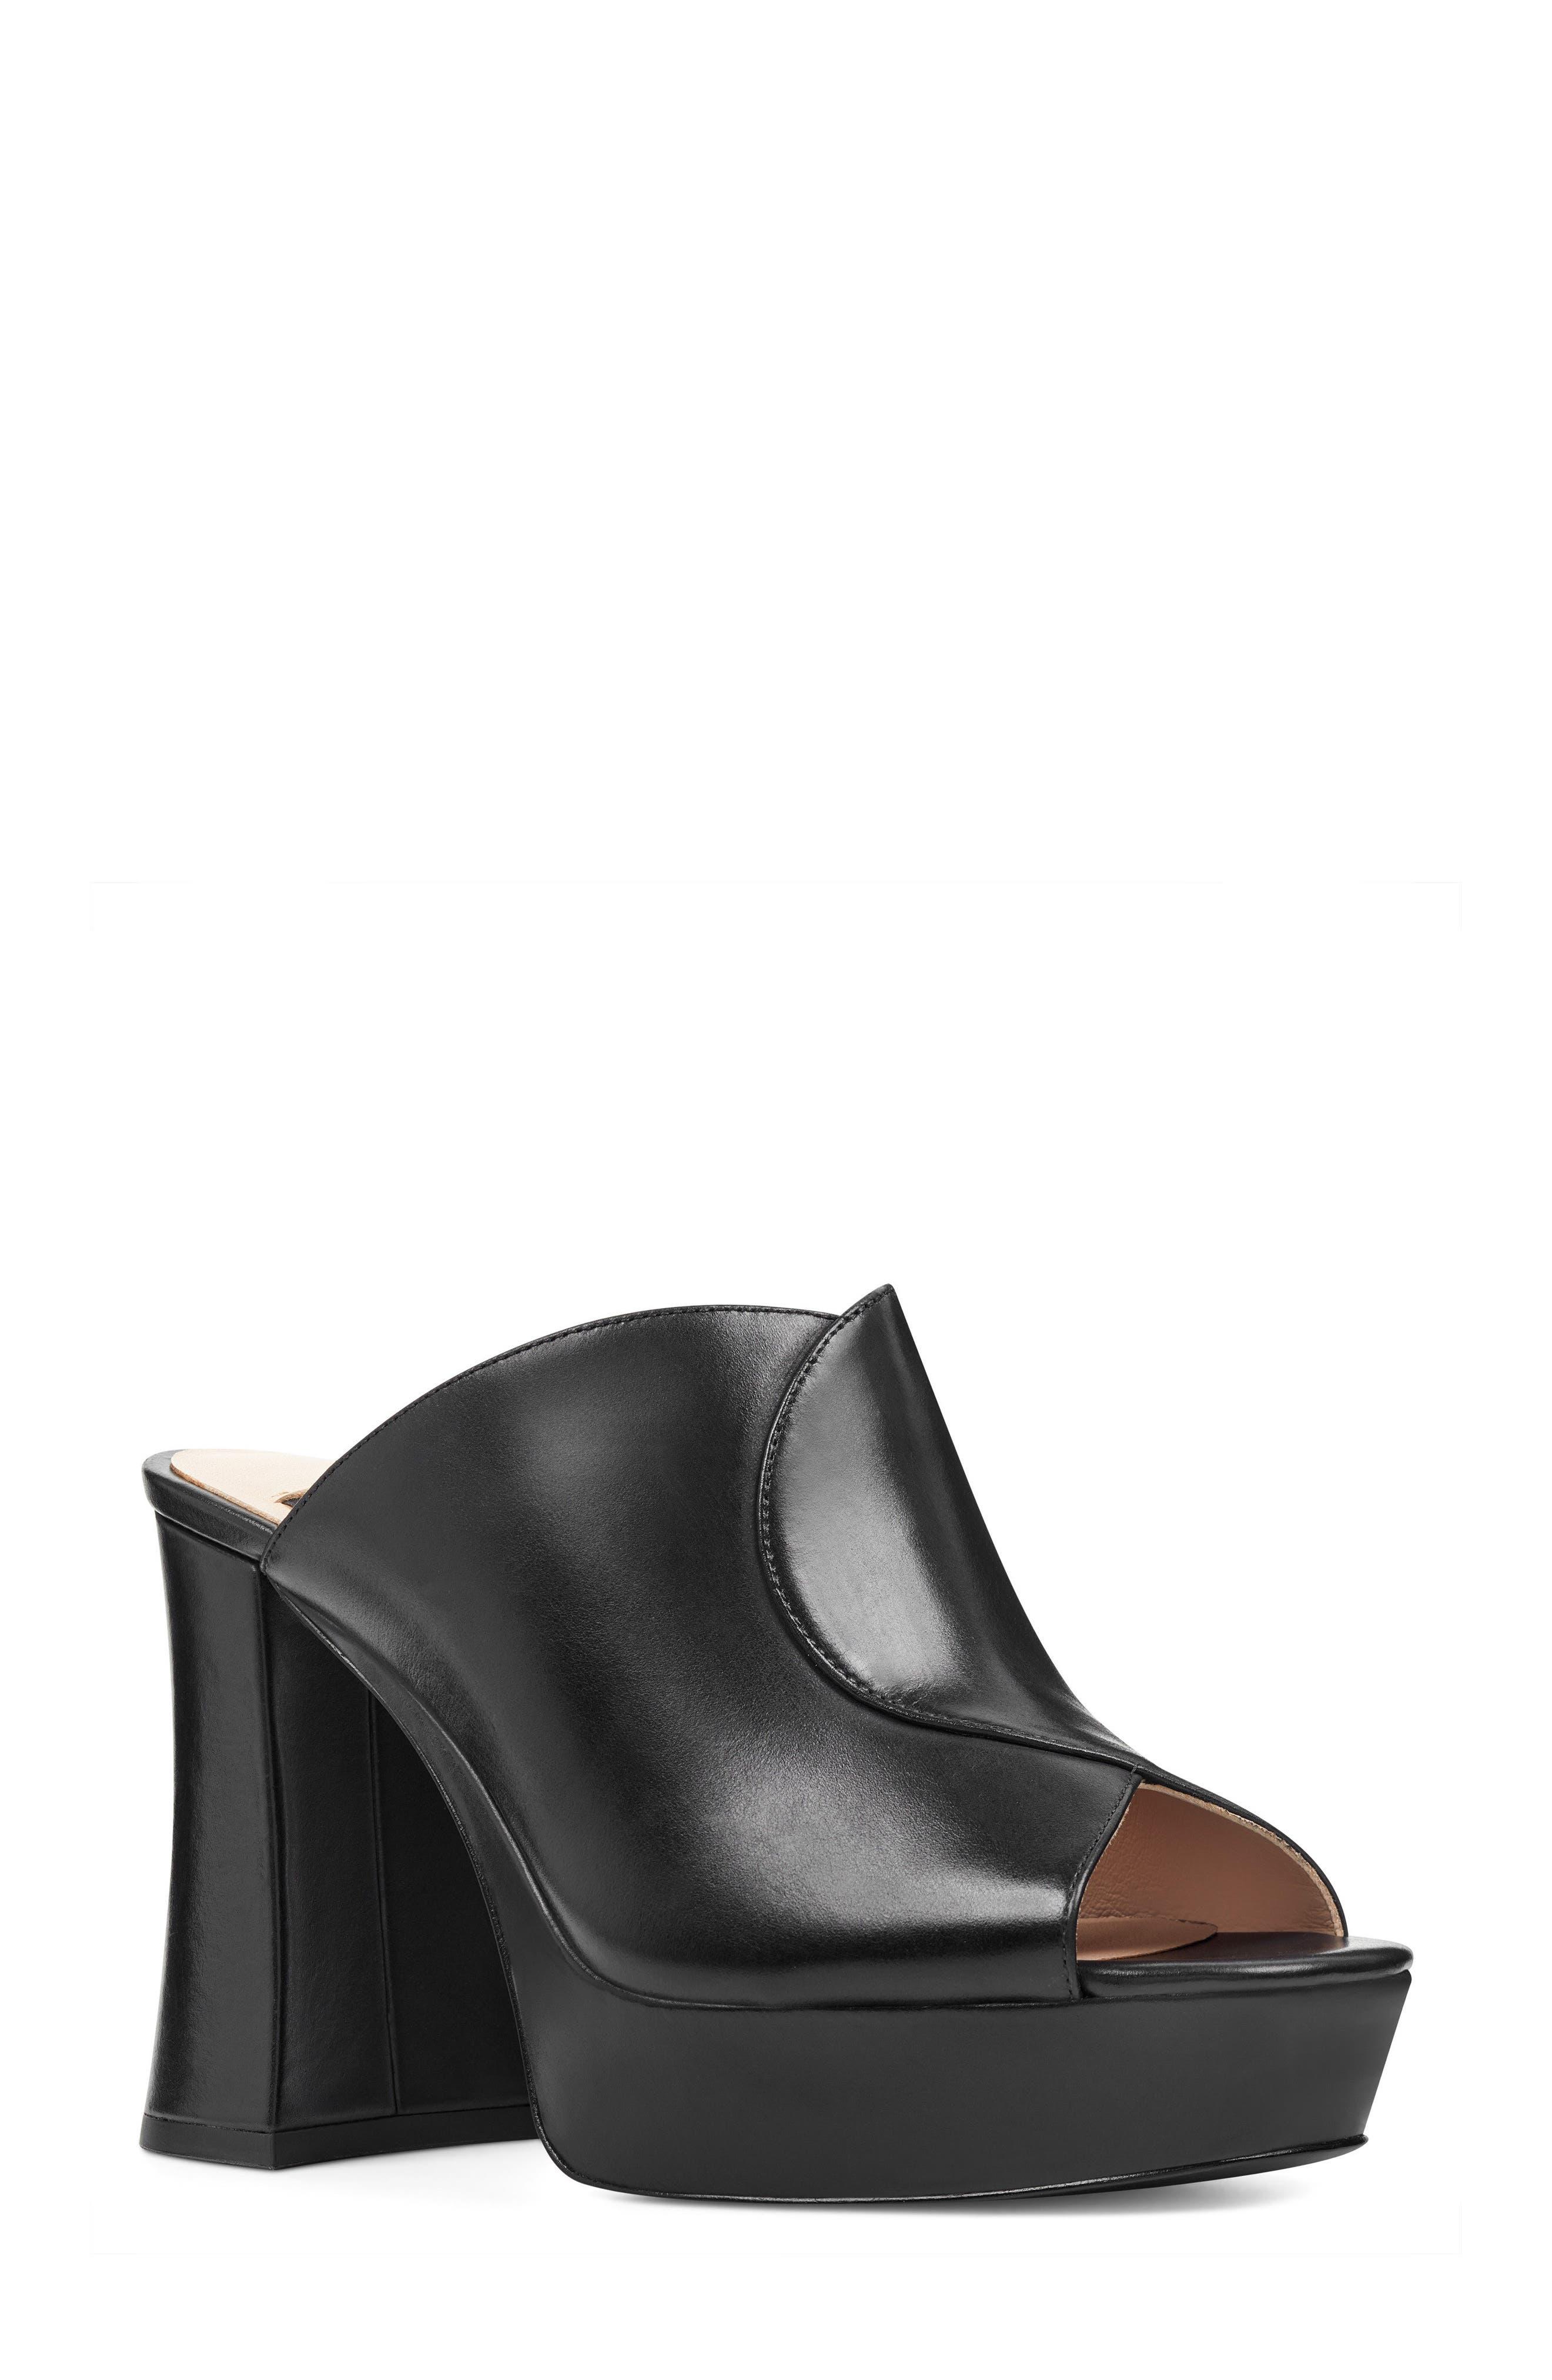 Lisana - 40th Anniversary Capsule Collection Platform Slide Sandal,                             Main thumbnail 1, color,                             BLACK LEATHER